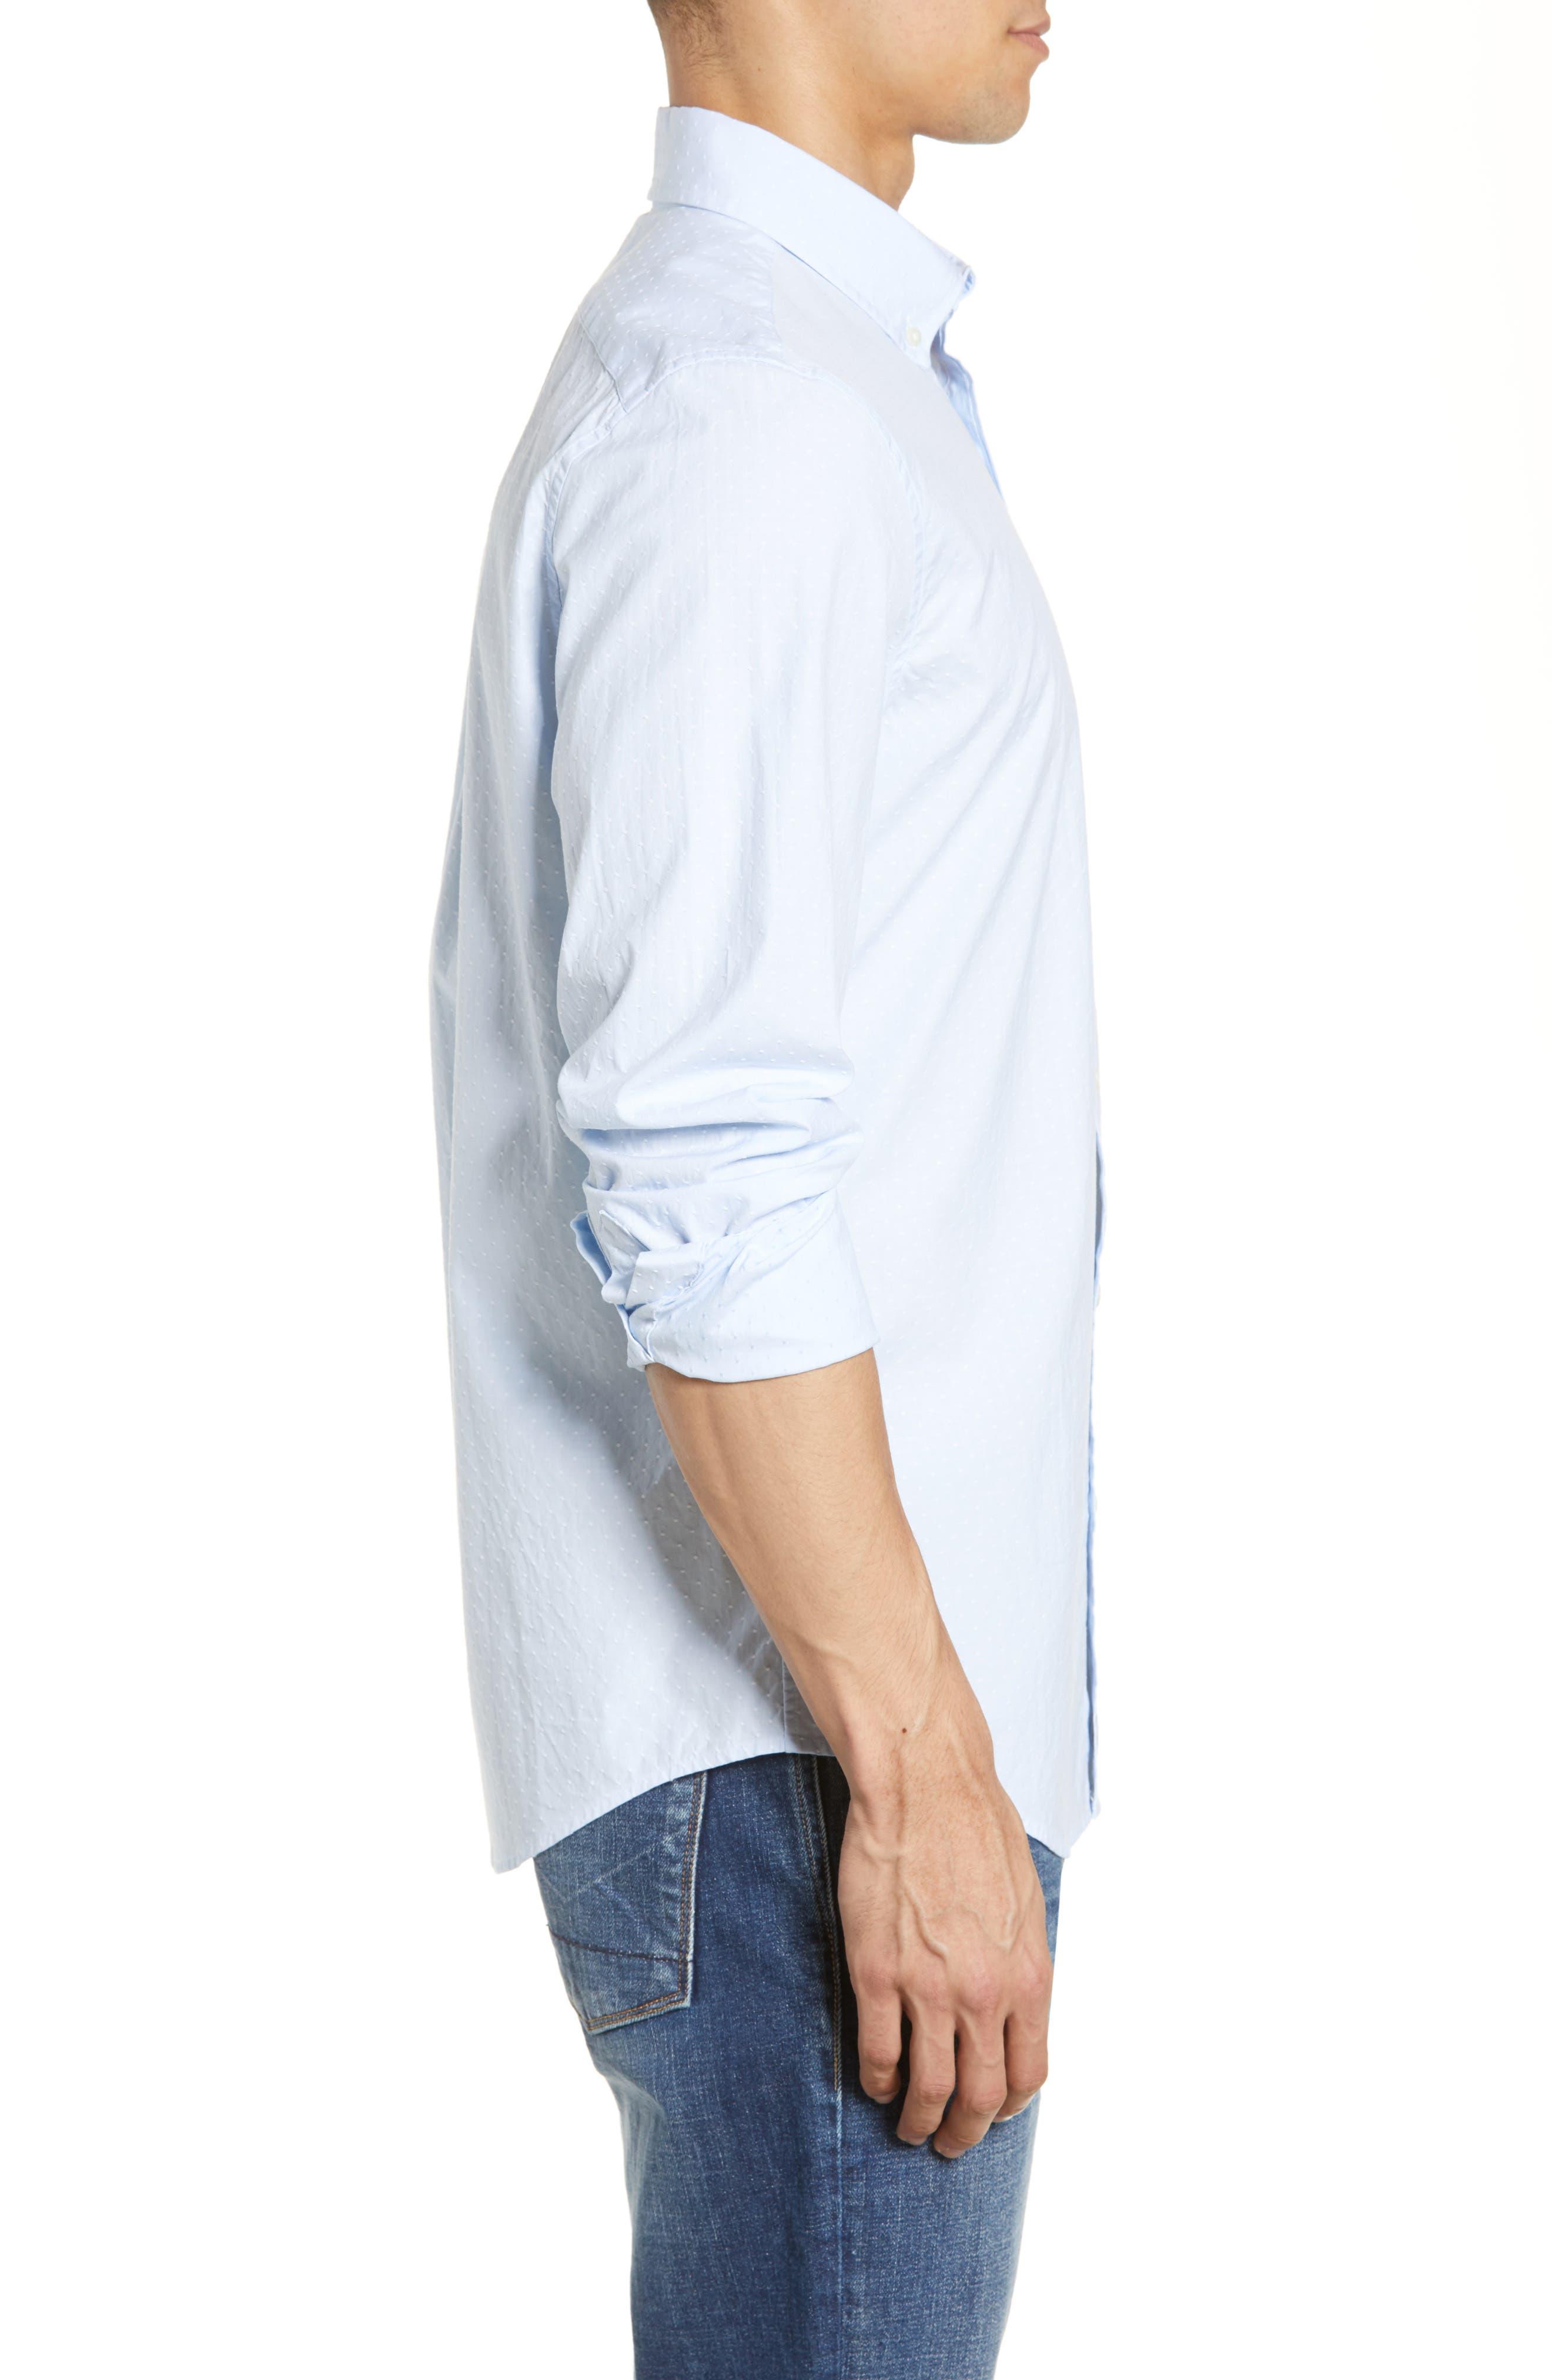 VINEYARD VINES, Wavine Slim Fit Dobby Sport Shirt, Alternate thumbnail 4, color, JAKE BLUE